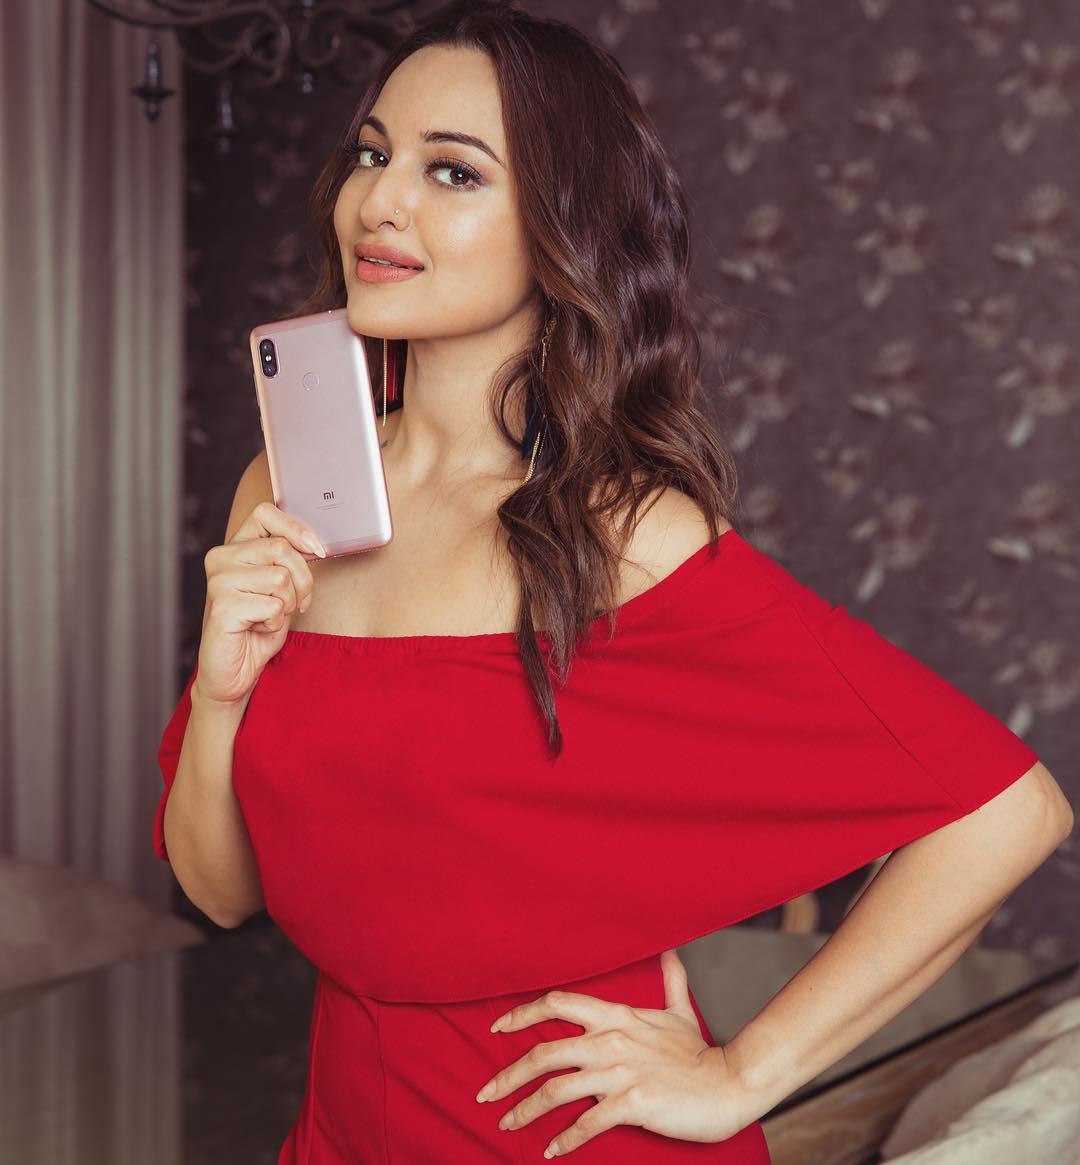 Dazzling Sonakshi Sinha in Red Dress